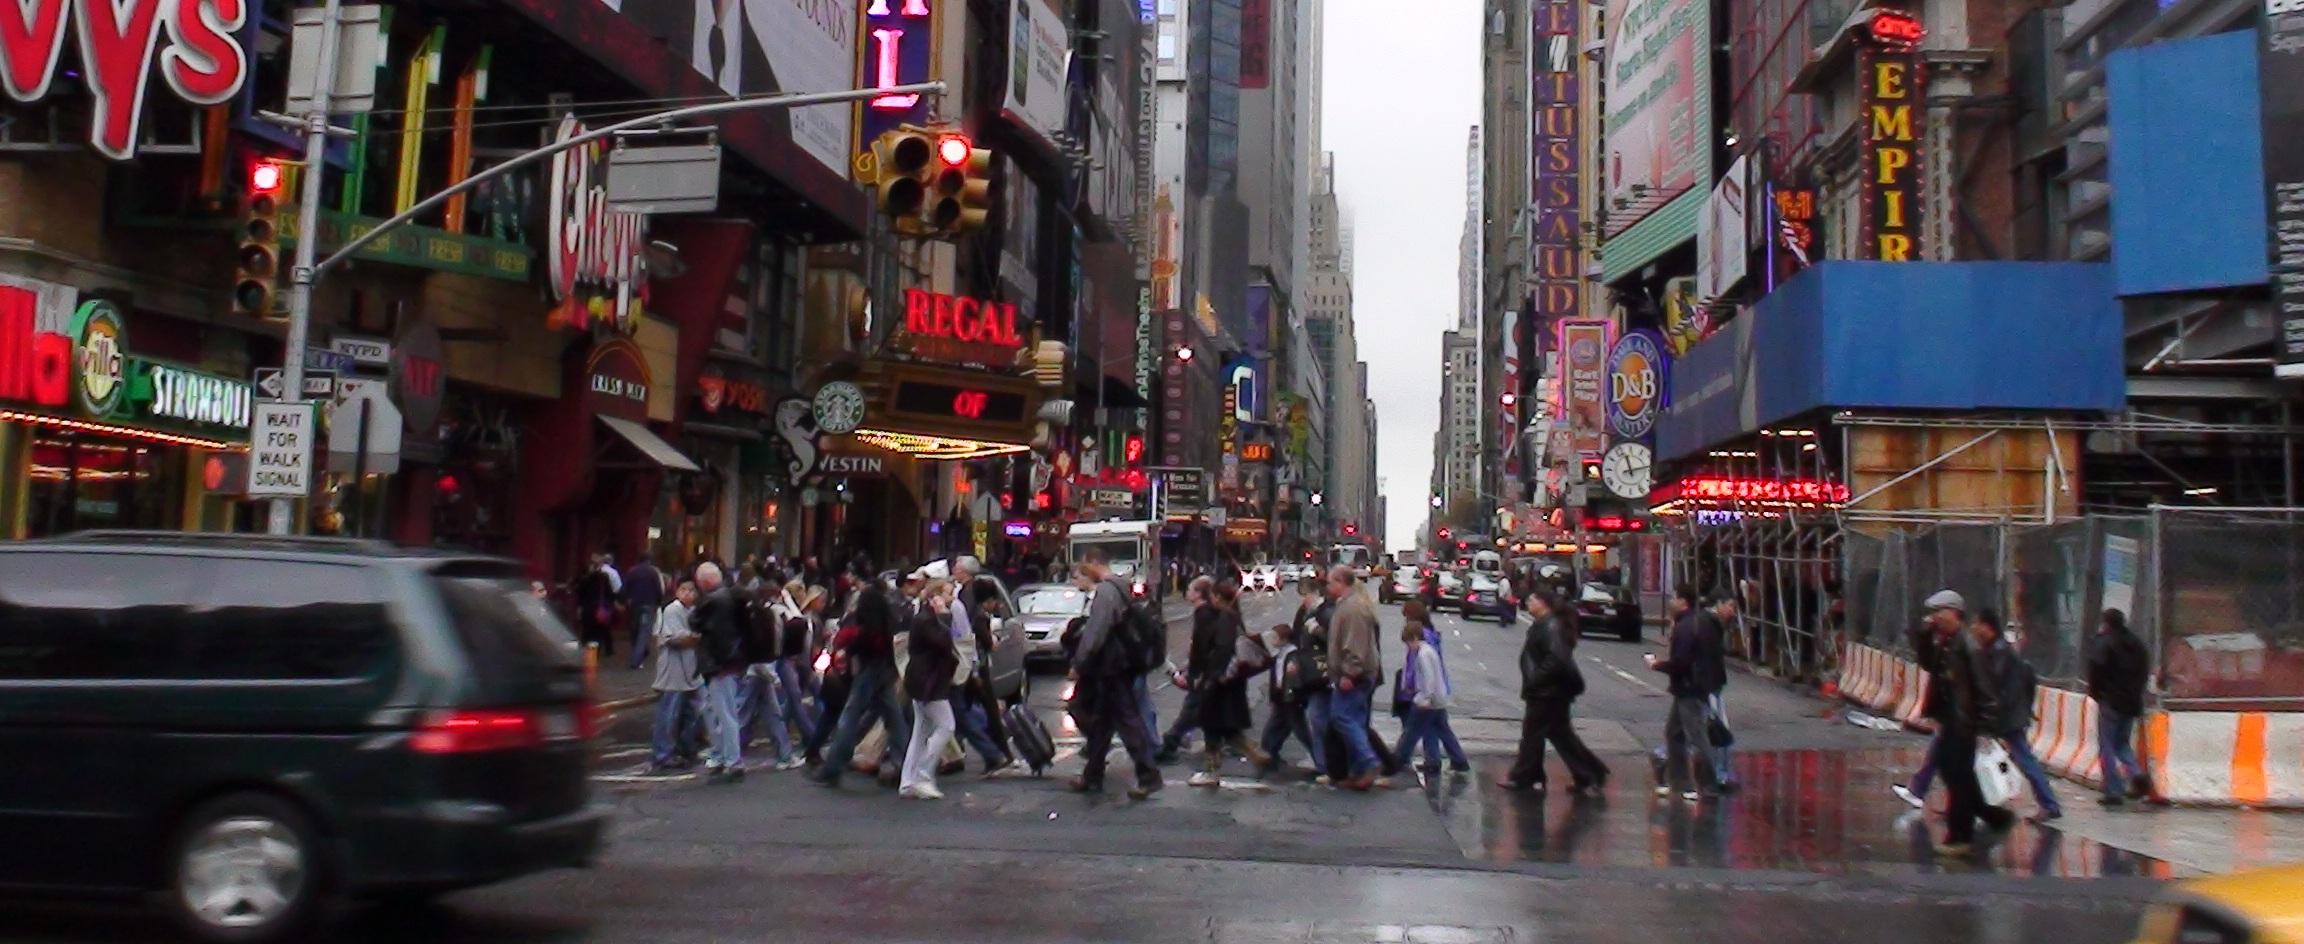 NYC+street+scene.jpg